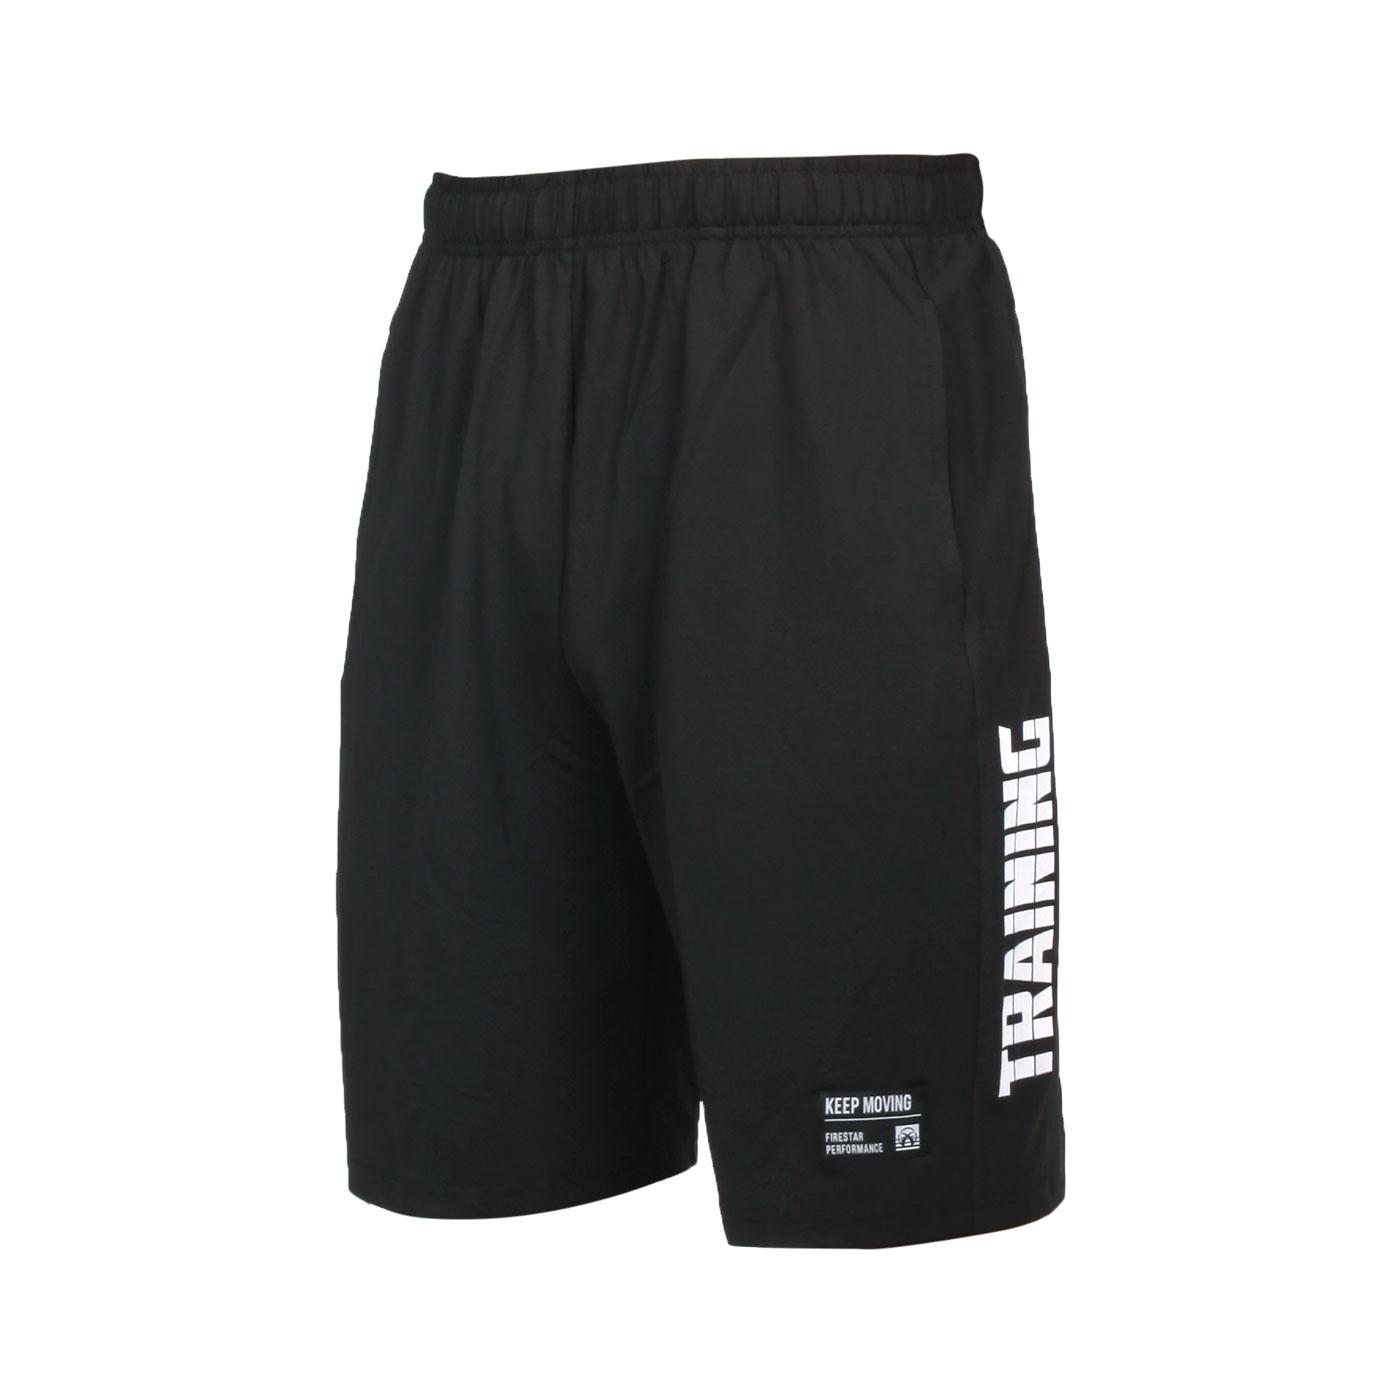 FIRESTAR 男款彈性訓練籃球短褲 B1703-20